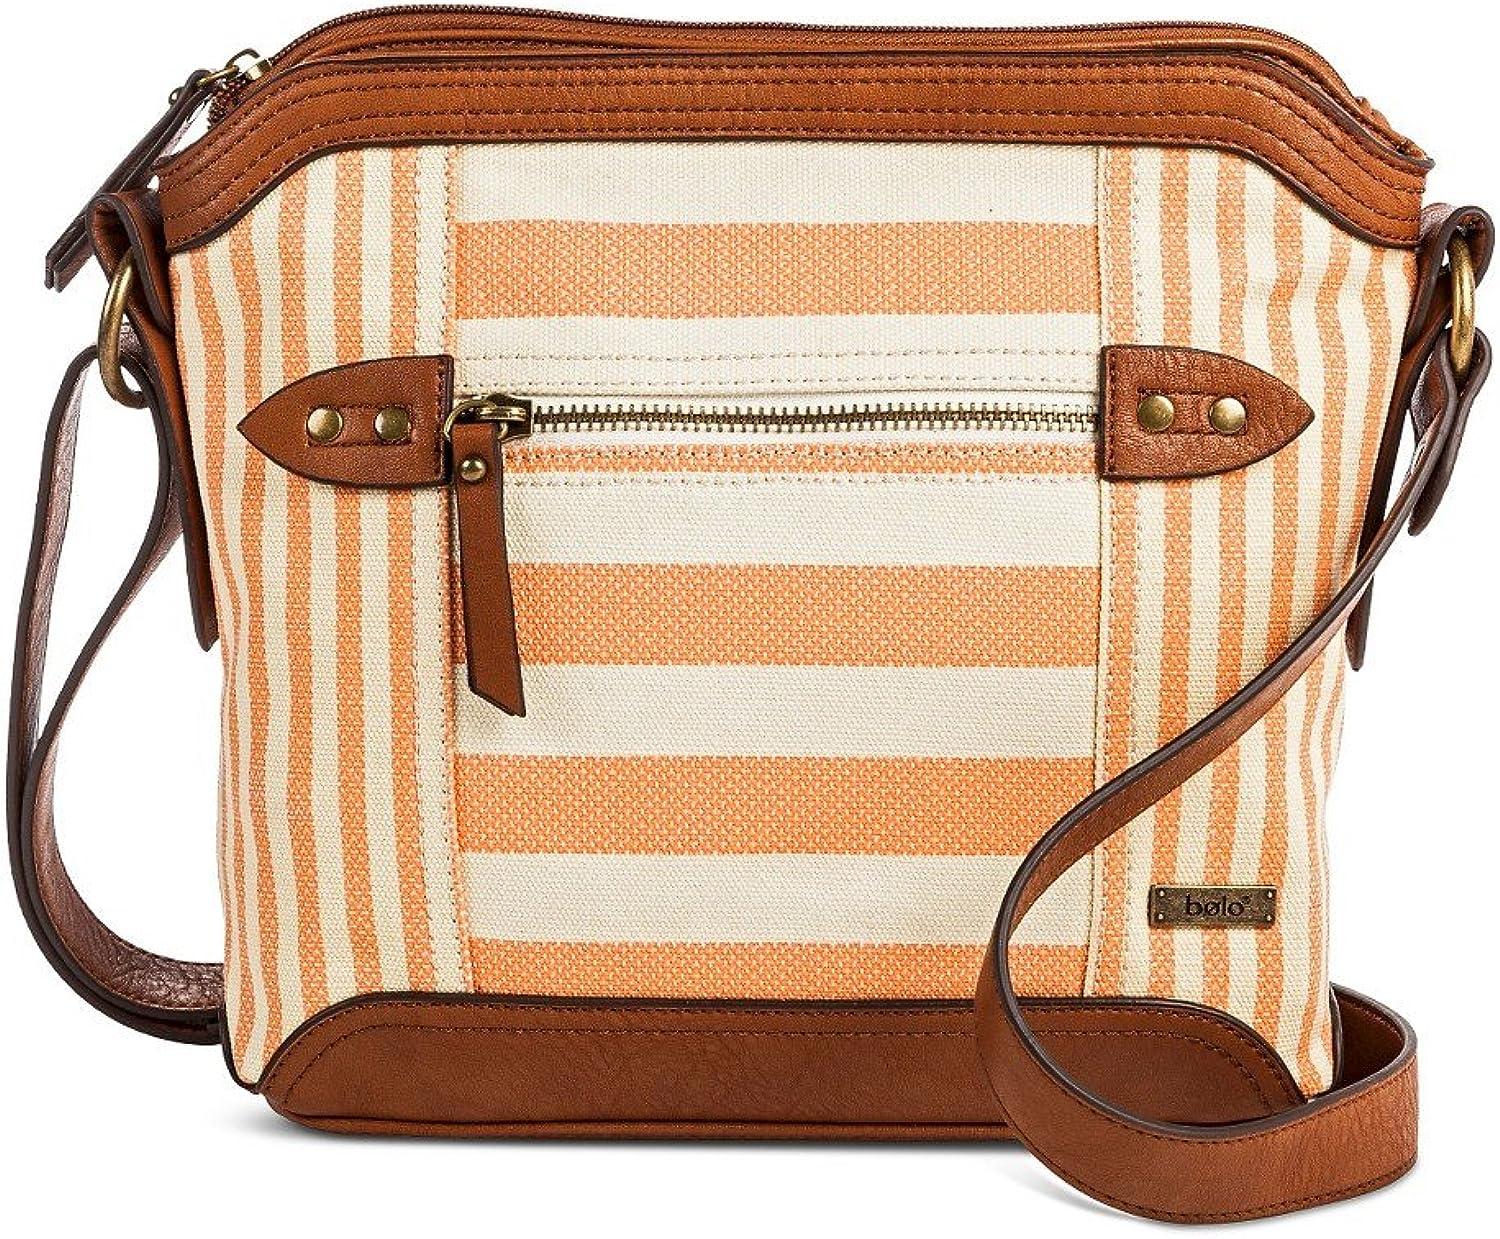 Bolo Women's Crossbody Handbag  Coral